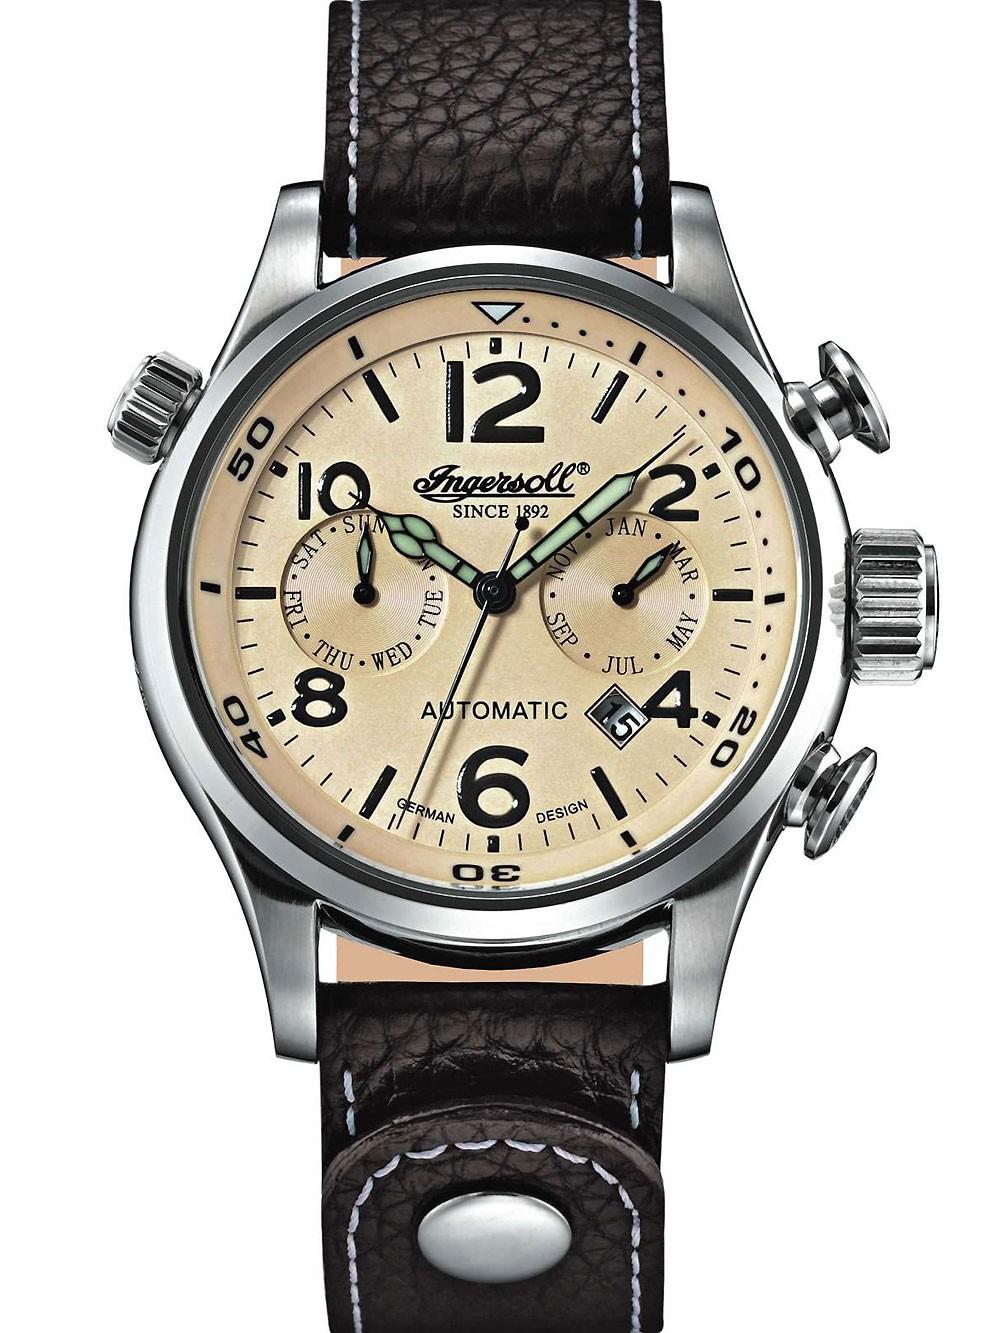 Watches Chrono12 Ingersoll Herrenuhr Bull Run In1809ch